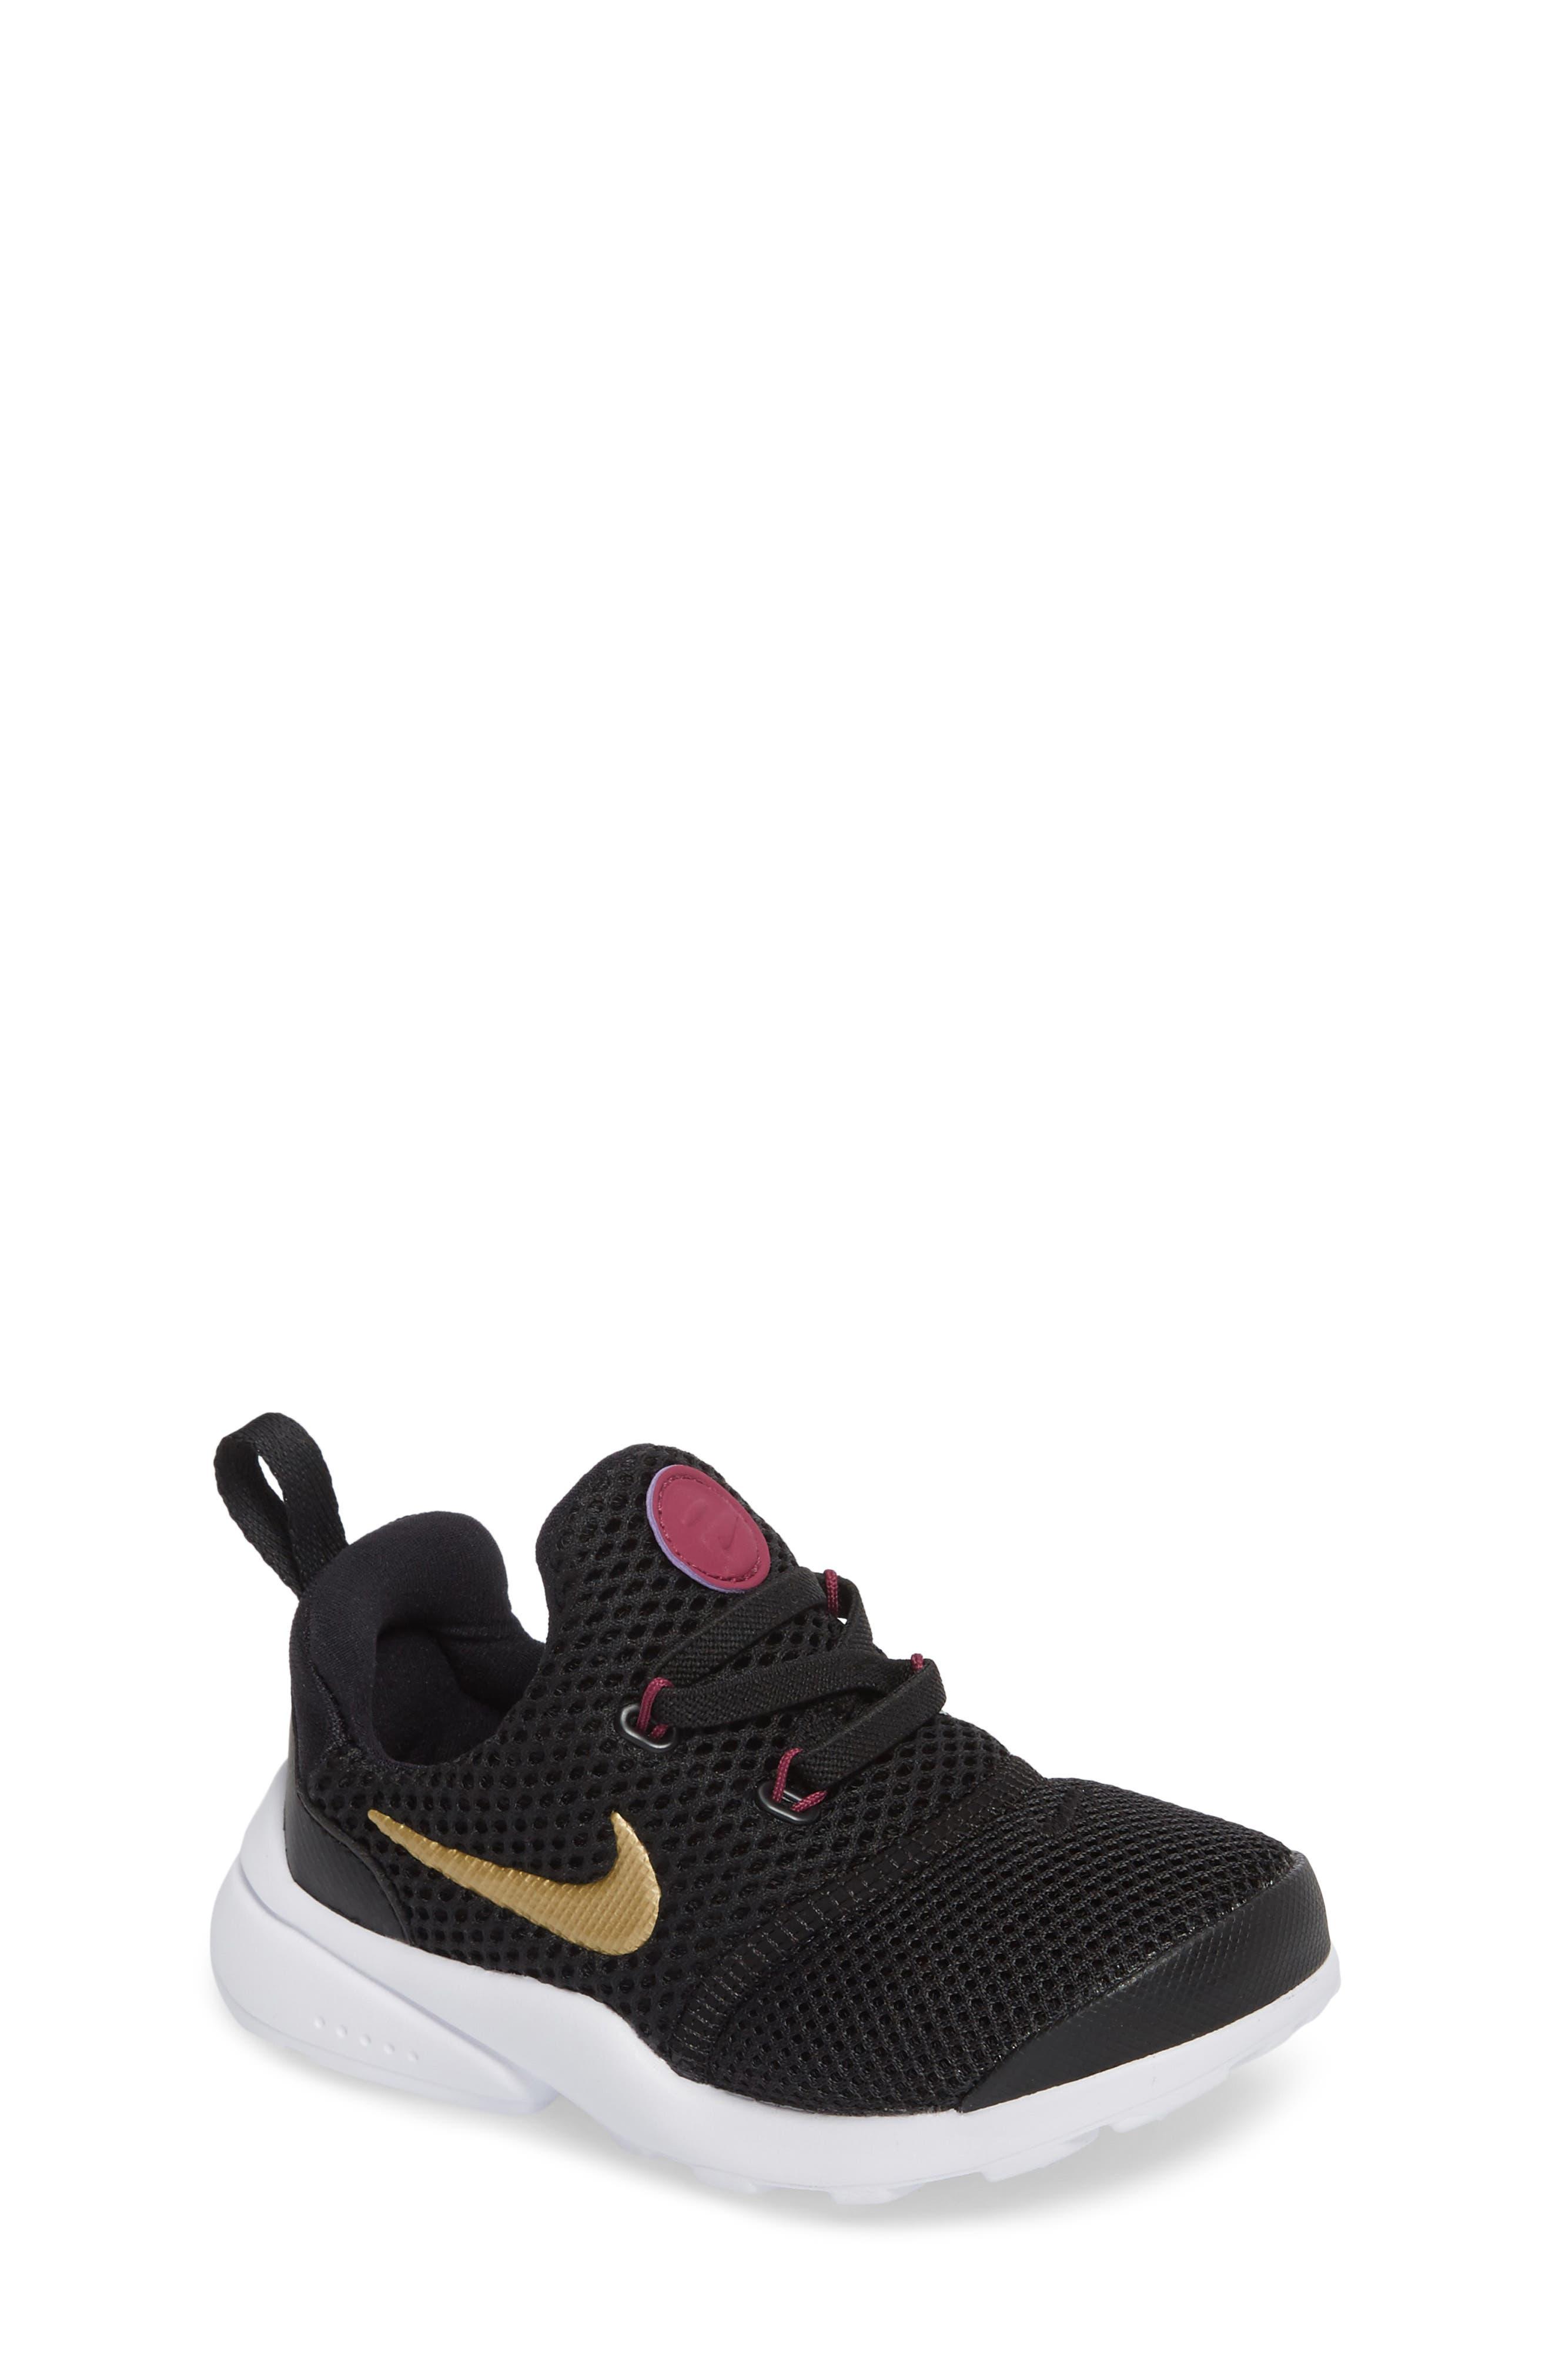 Presto Fly Sneaker,                             Main thumbnail 1, color,                             Black/ Gold